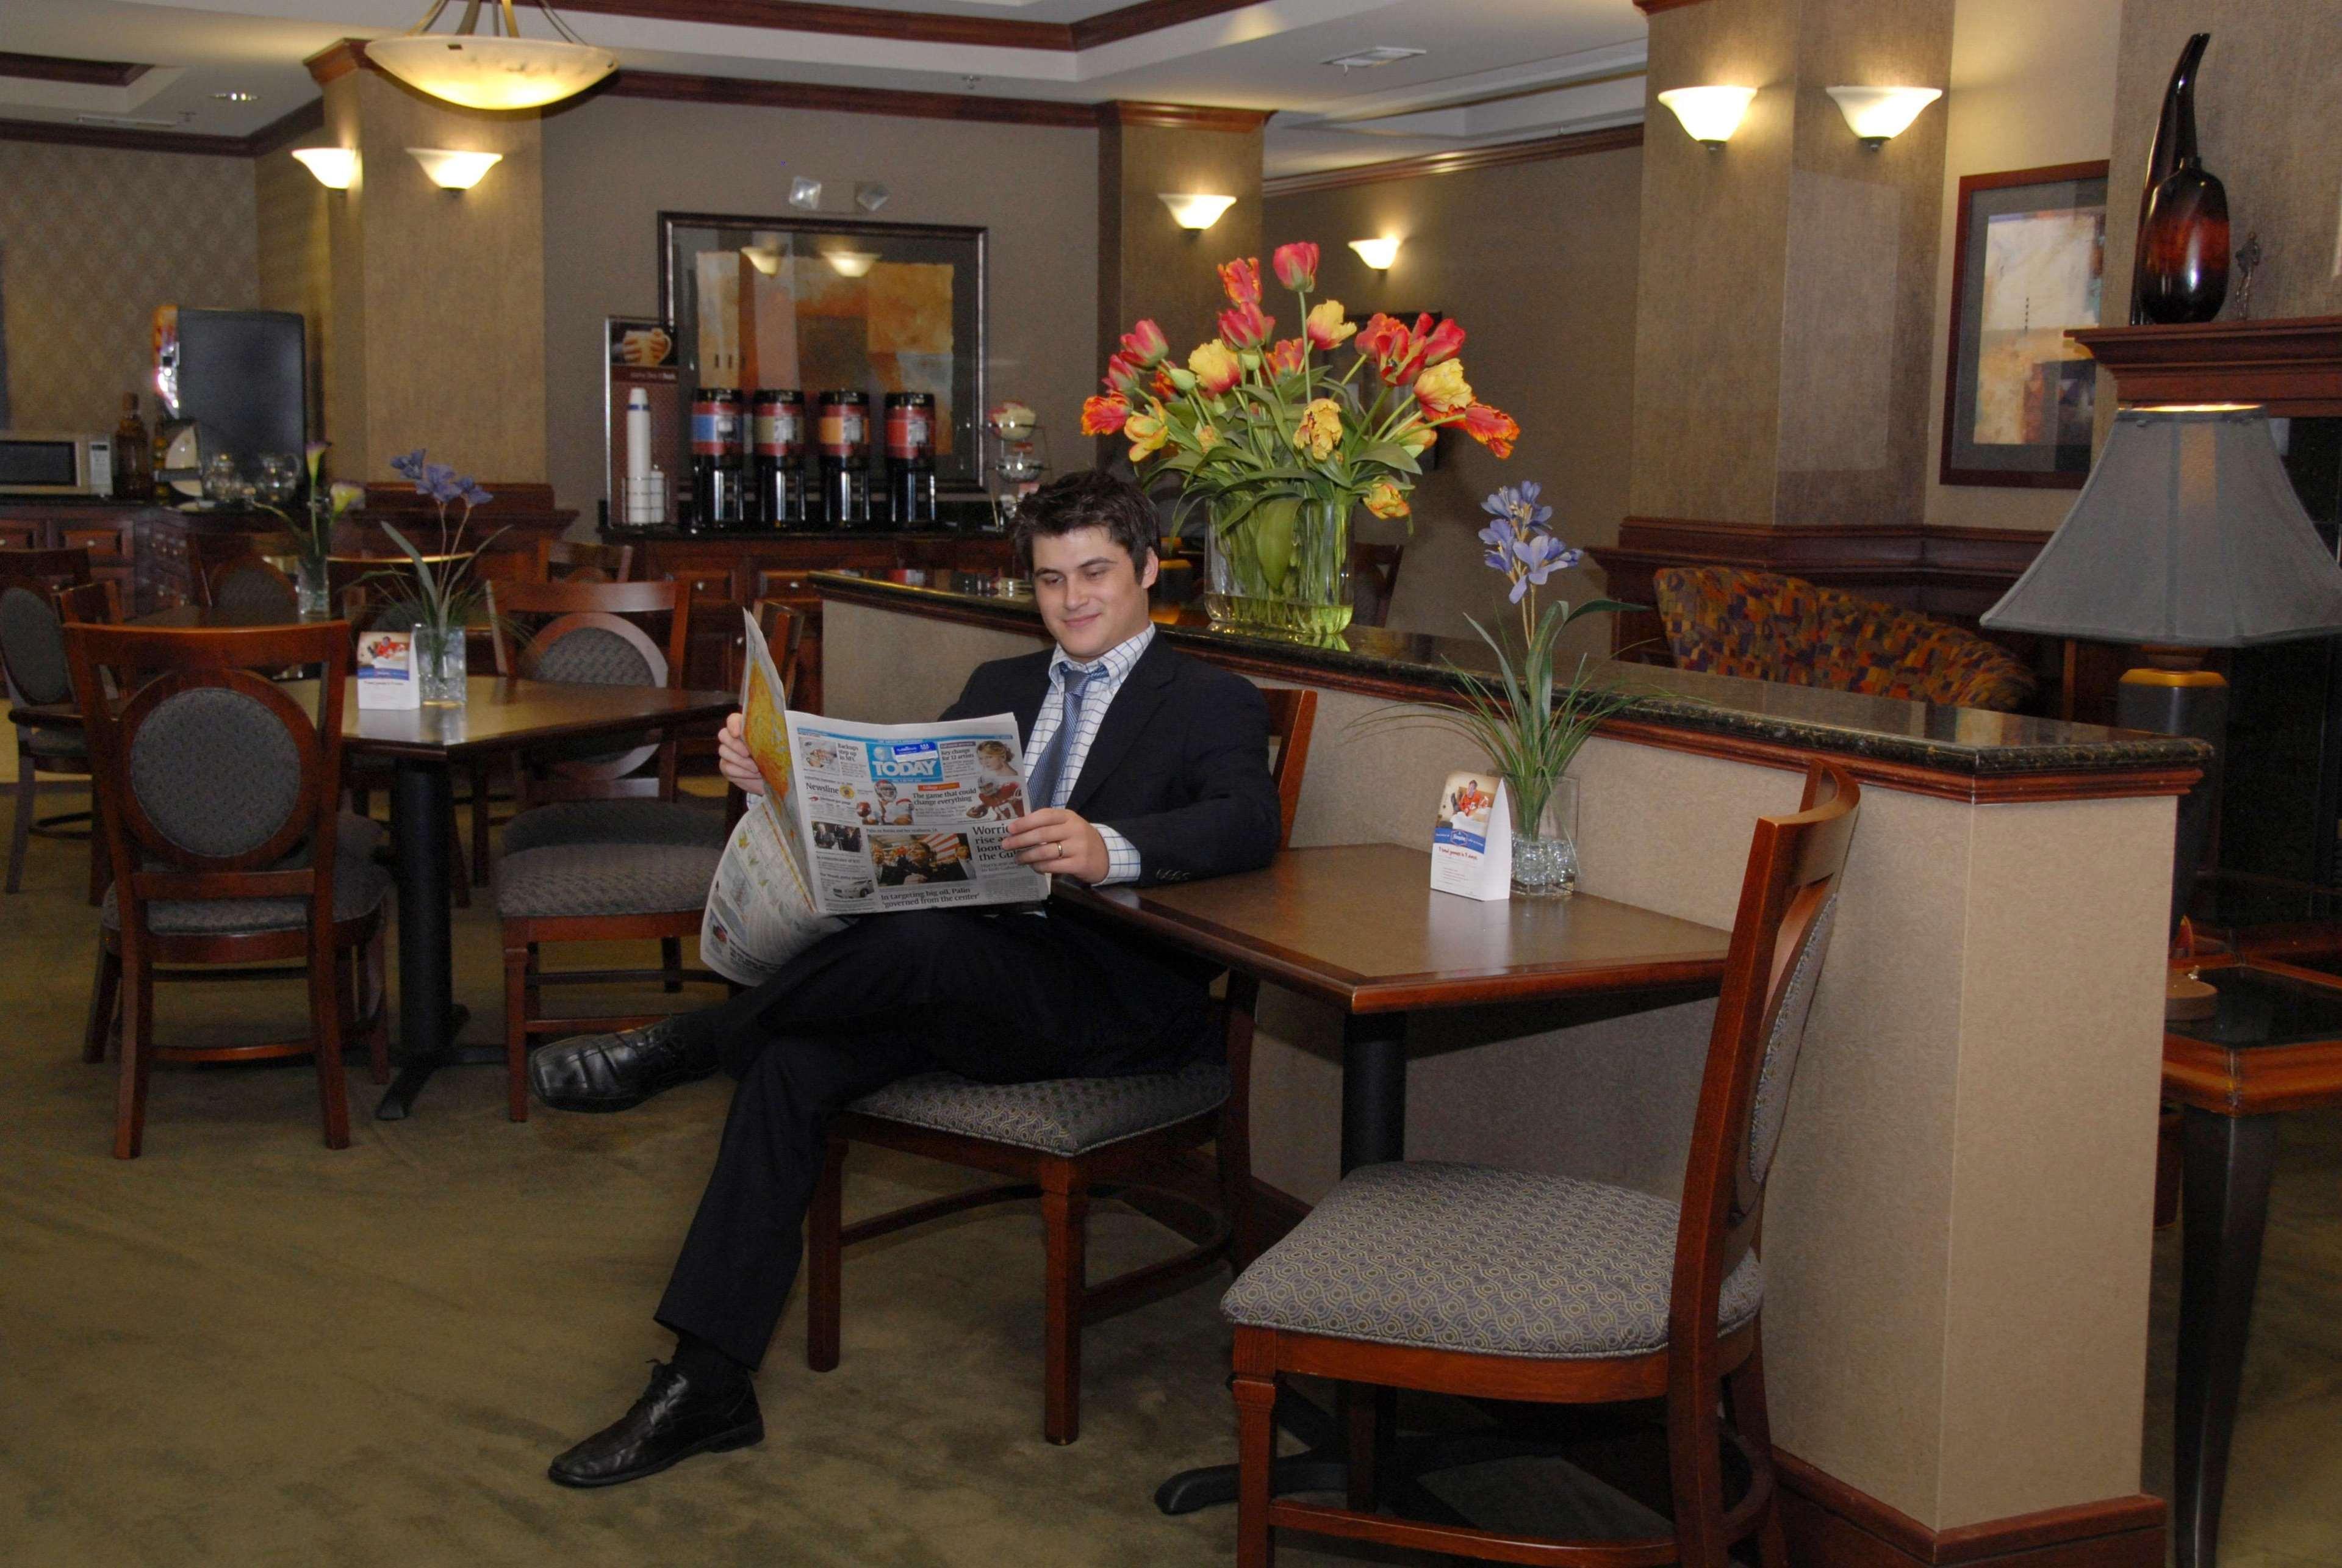 Hampton Inn Van Buren image 4